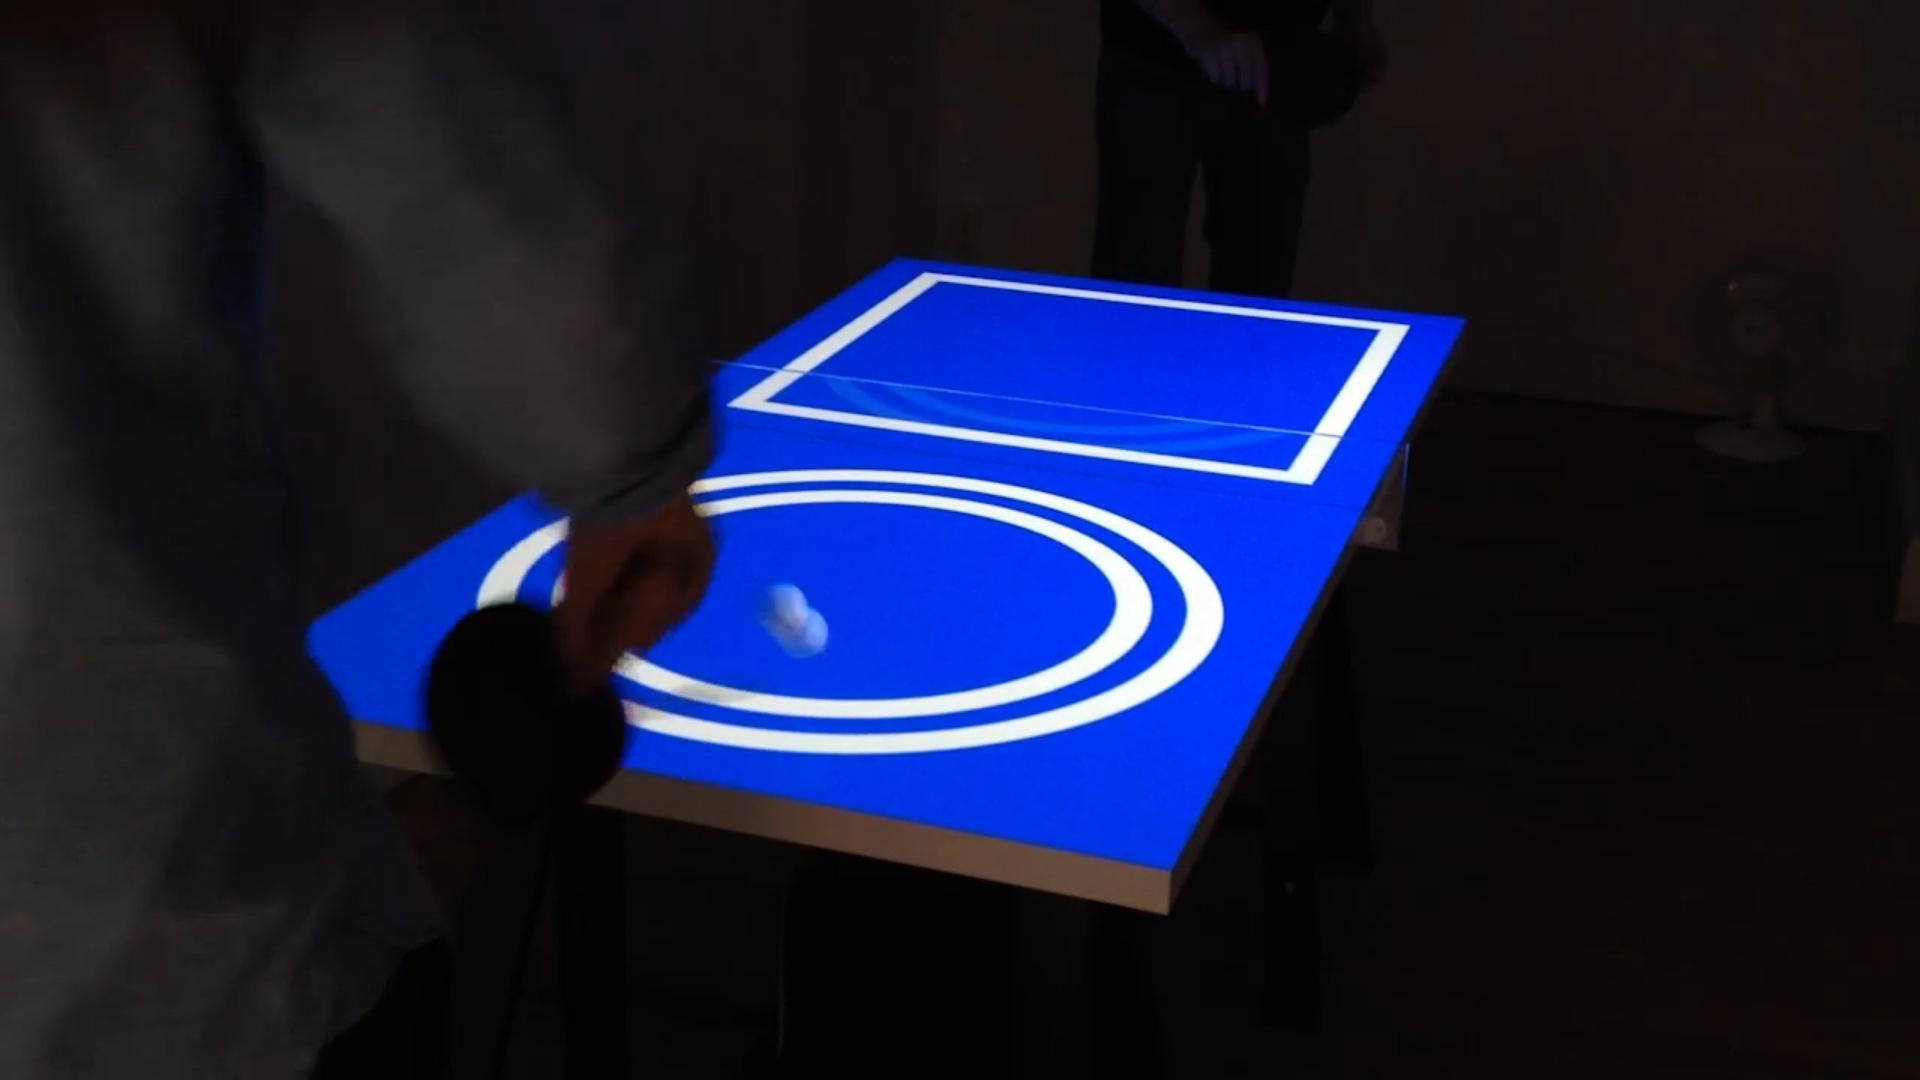 david-rinman-tennis-table-musical-L-5FYv7V